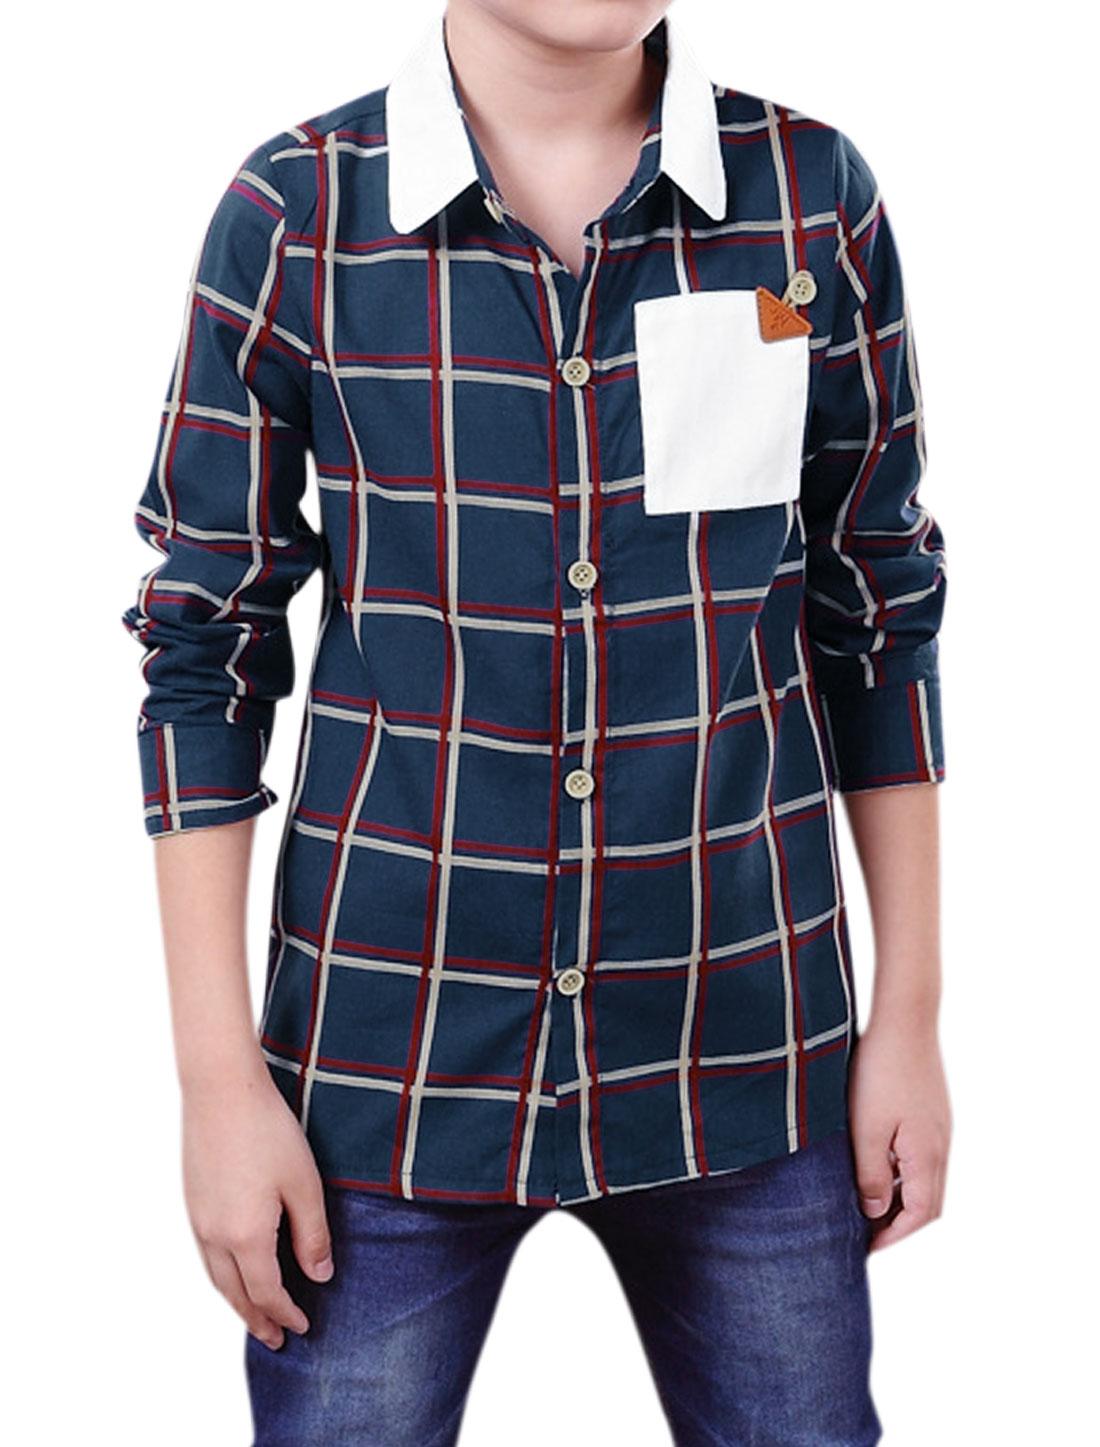 Boys Turn Down Collar Long Sleeves Plaid Shirt Navy Blue 14